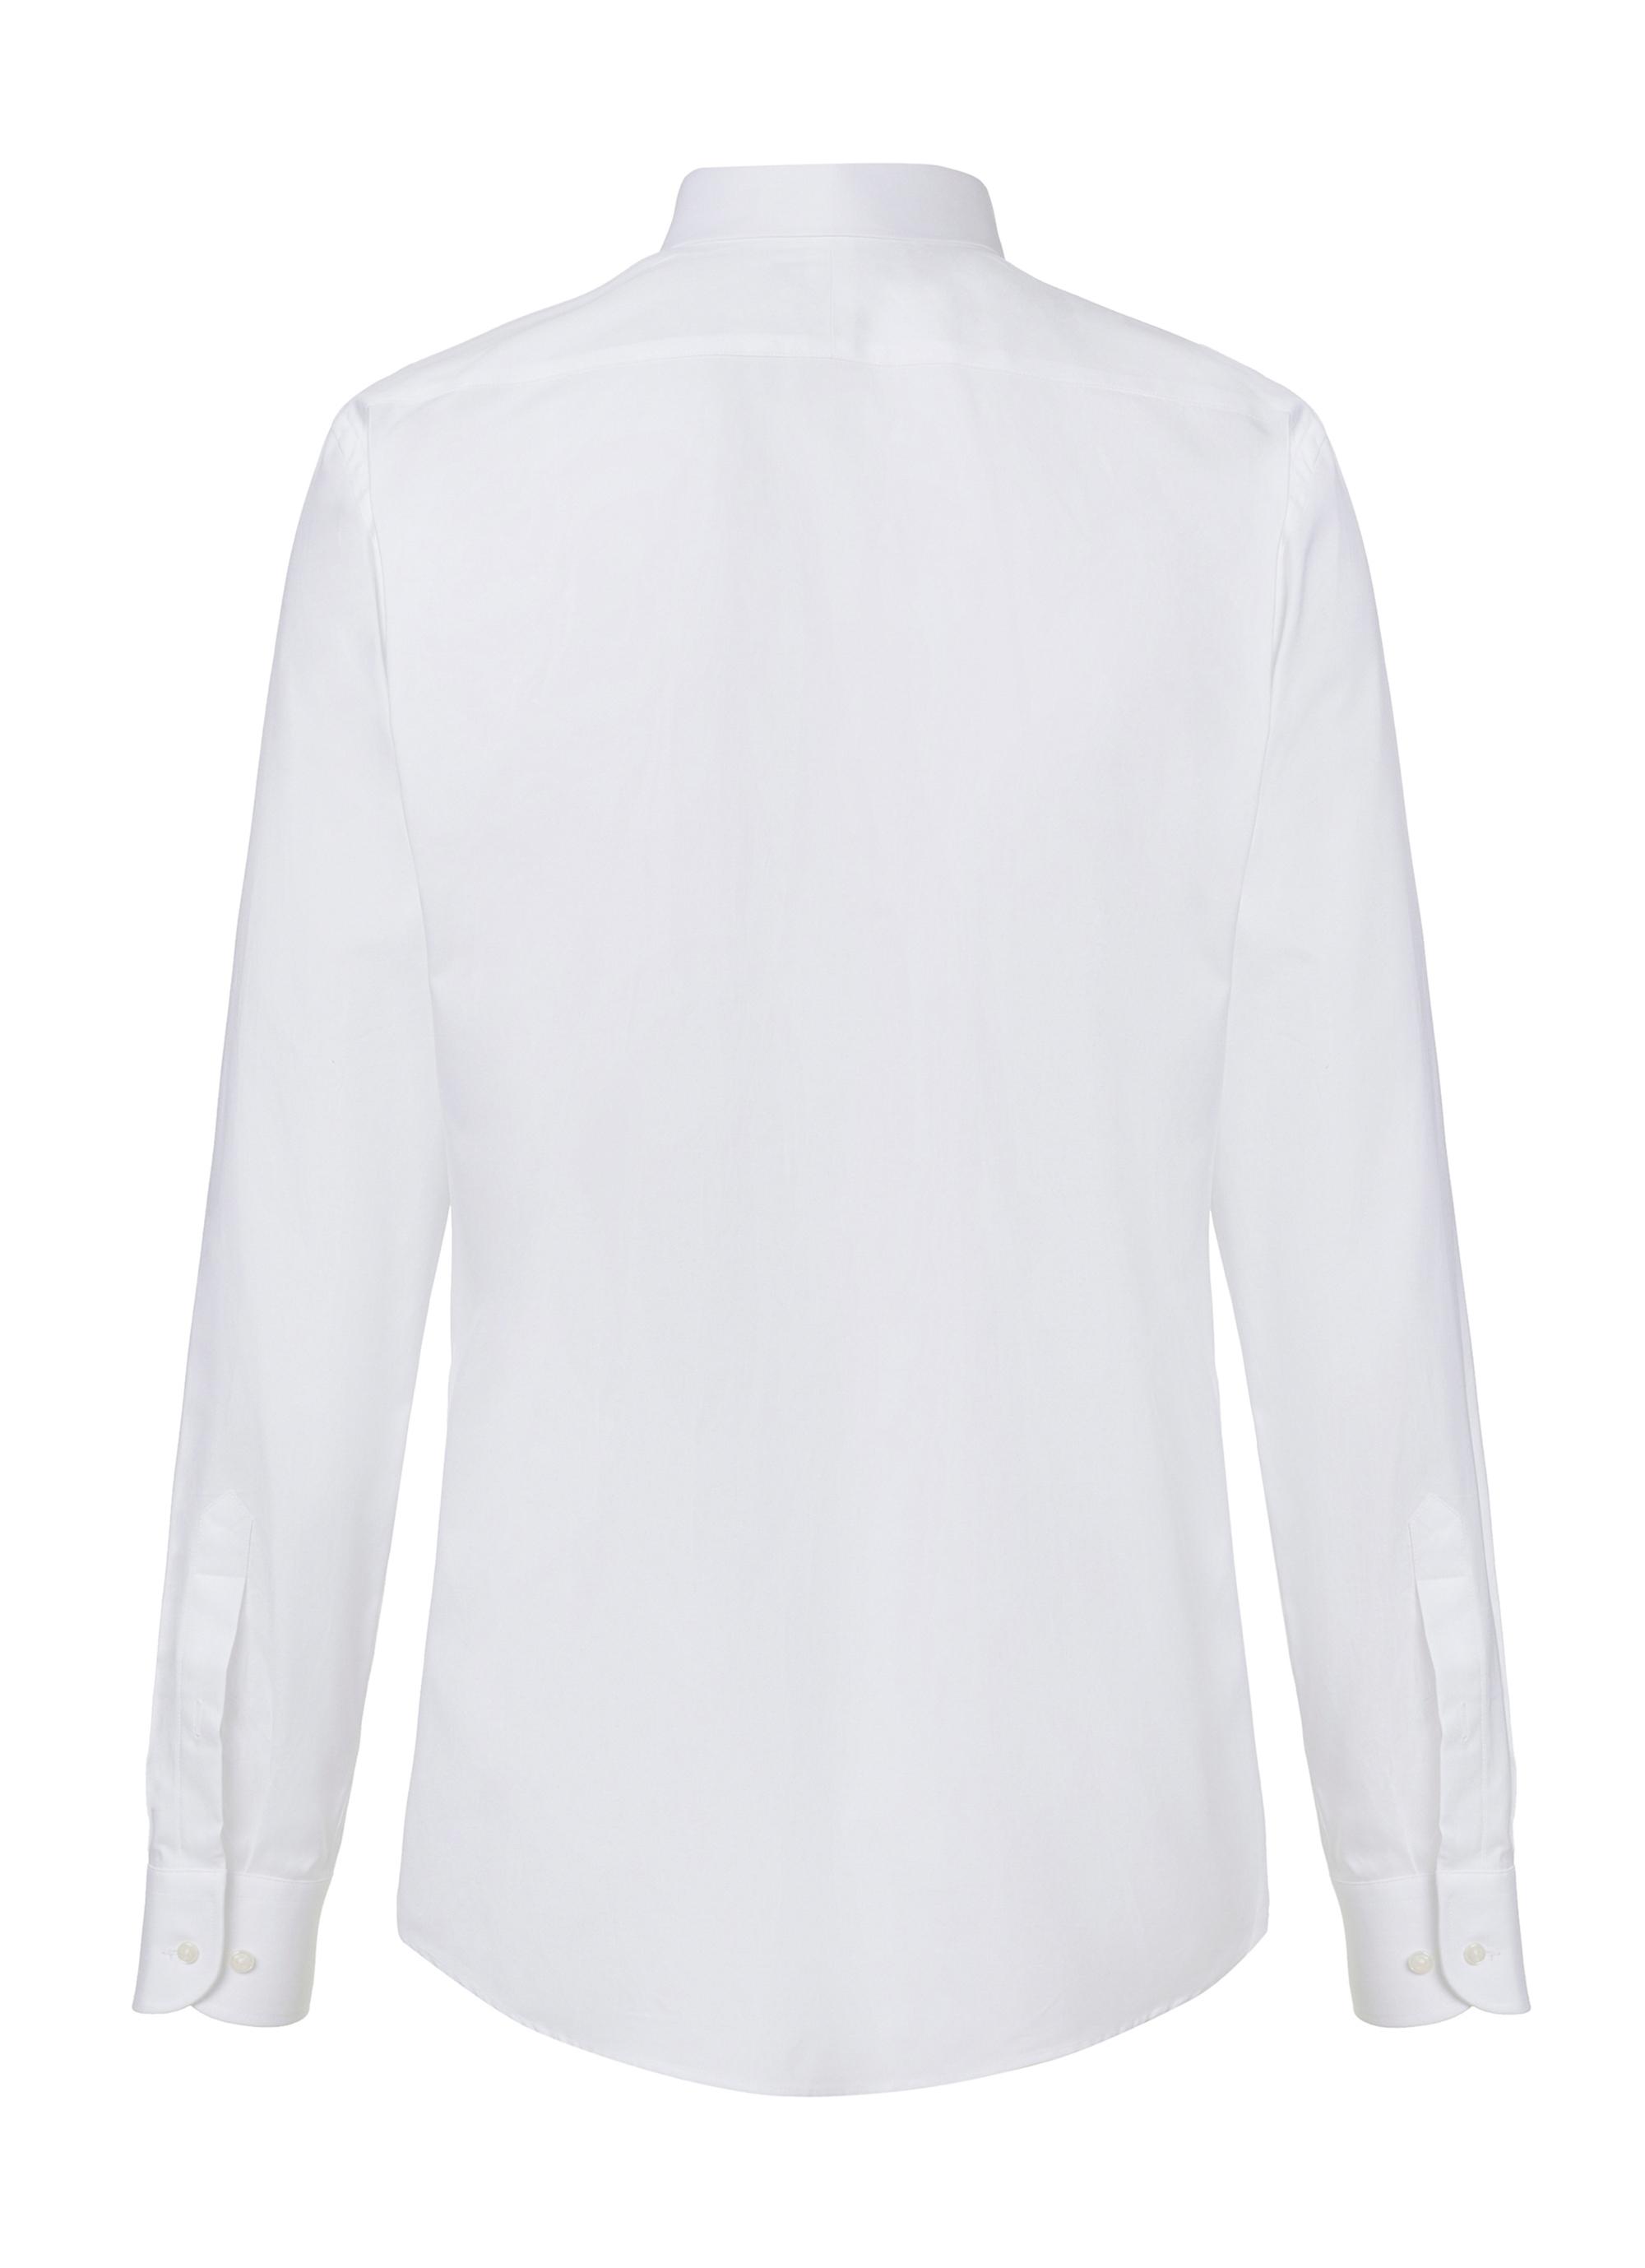 Shirt Tunic Marcella Double cuff Collar less R625